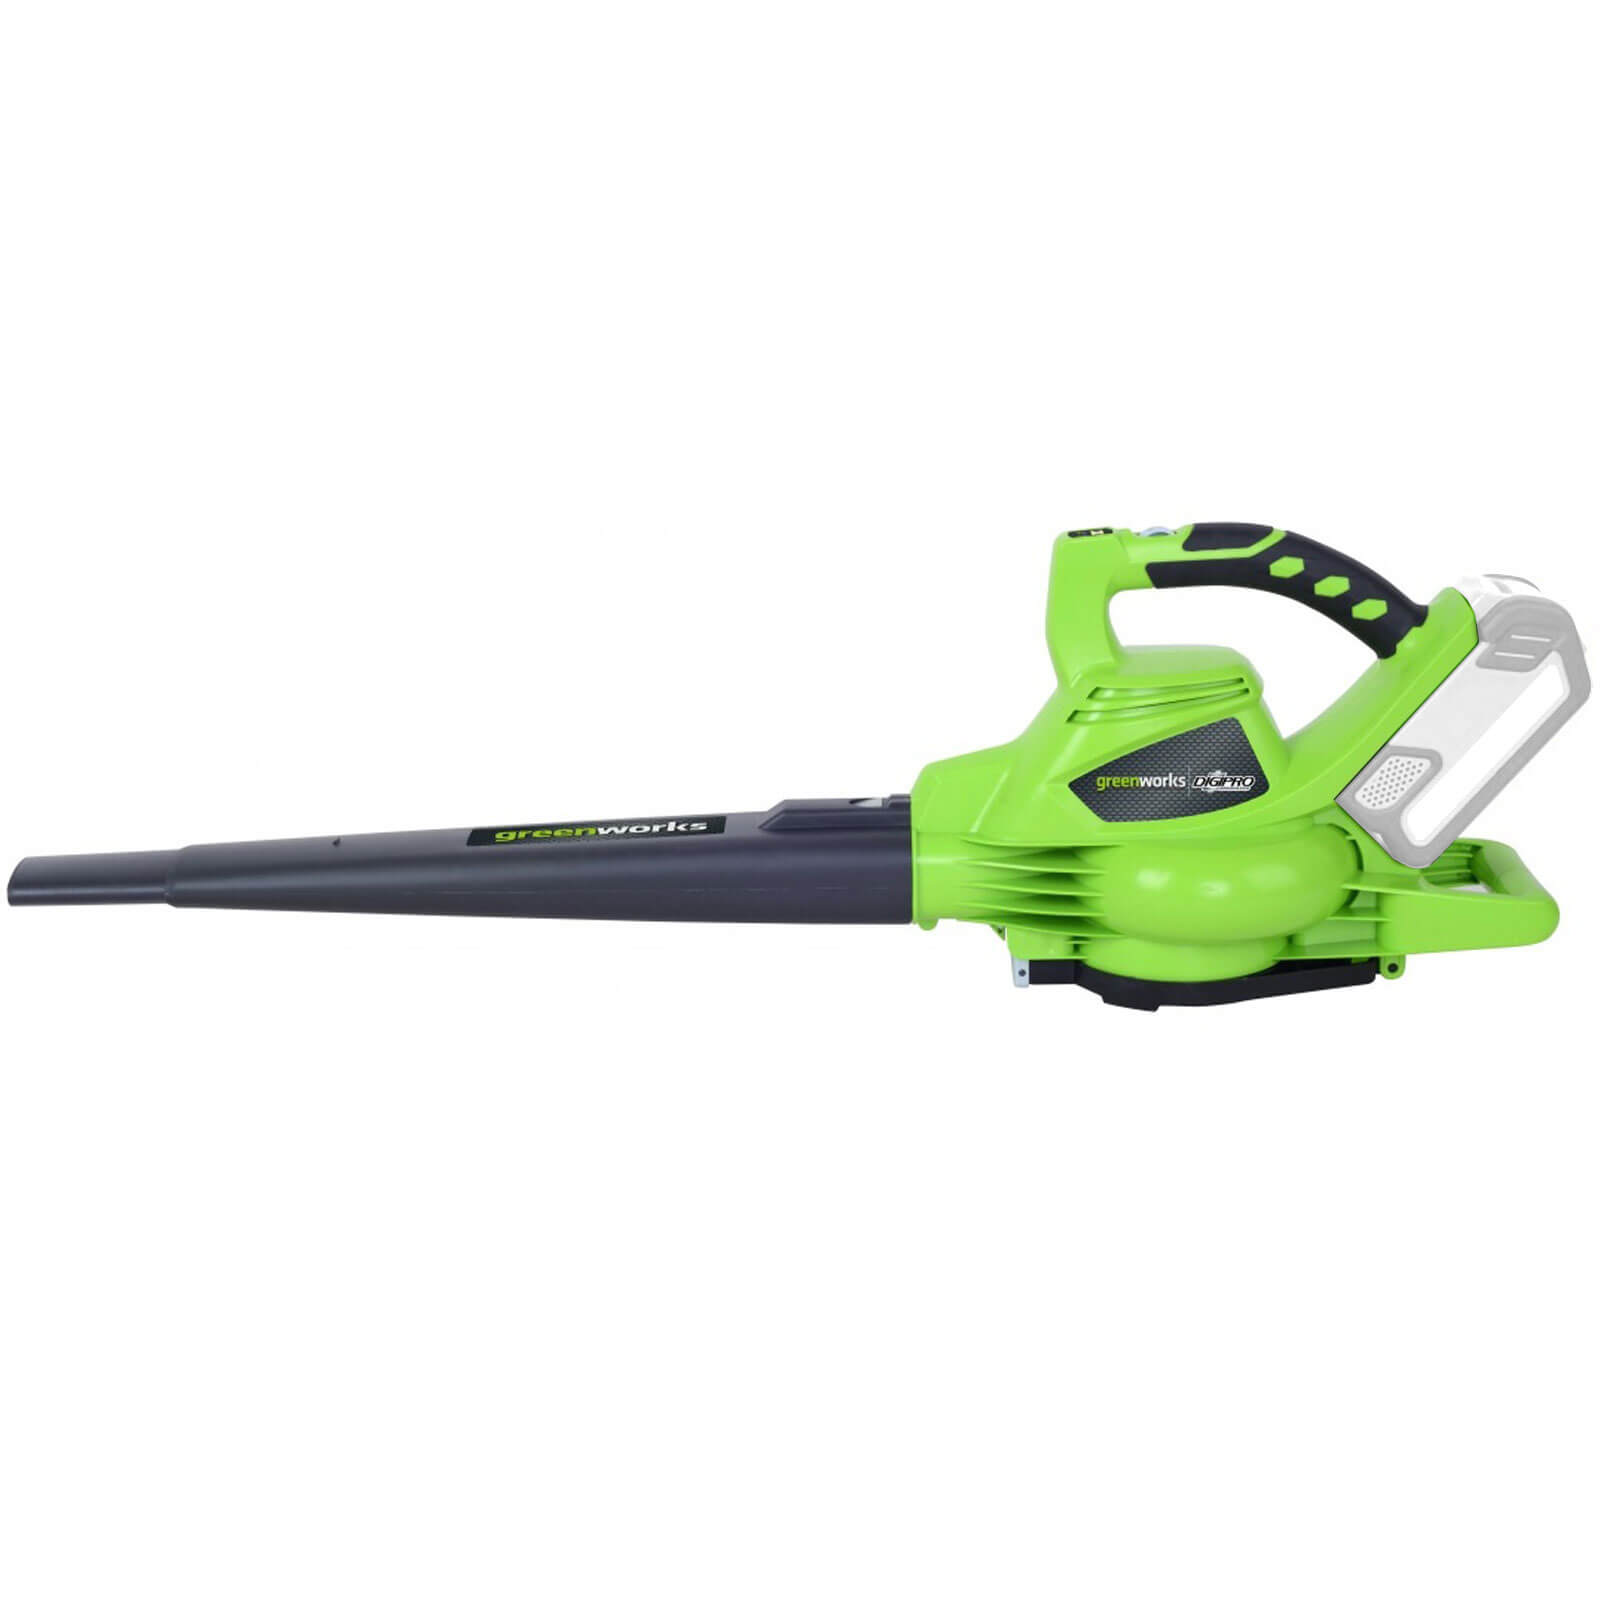 Greenworks GD40BV 40v Cordless Brushless Garden Vacuum and Leaf Blower No Batteries No Charger